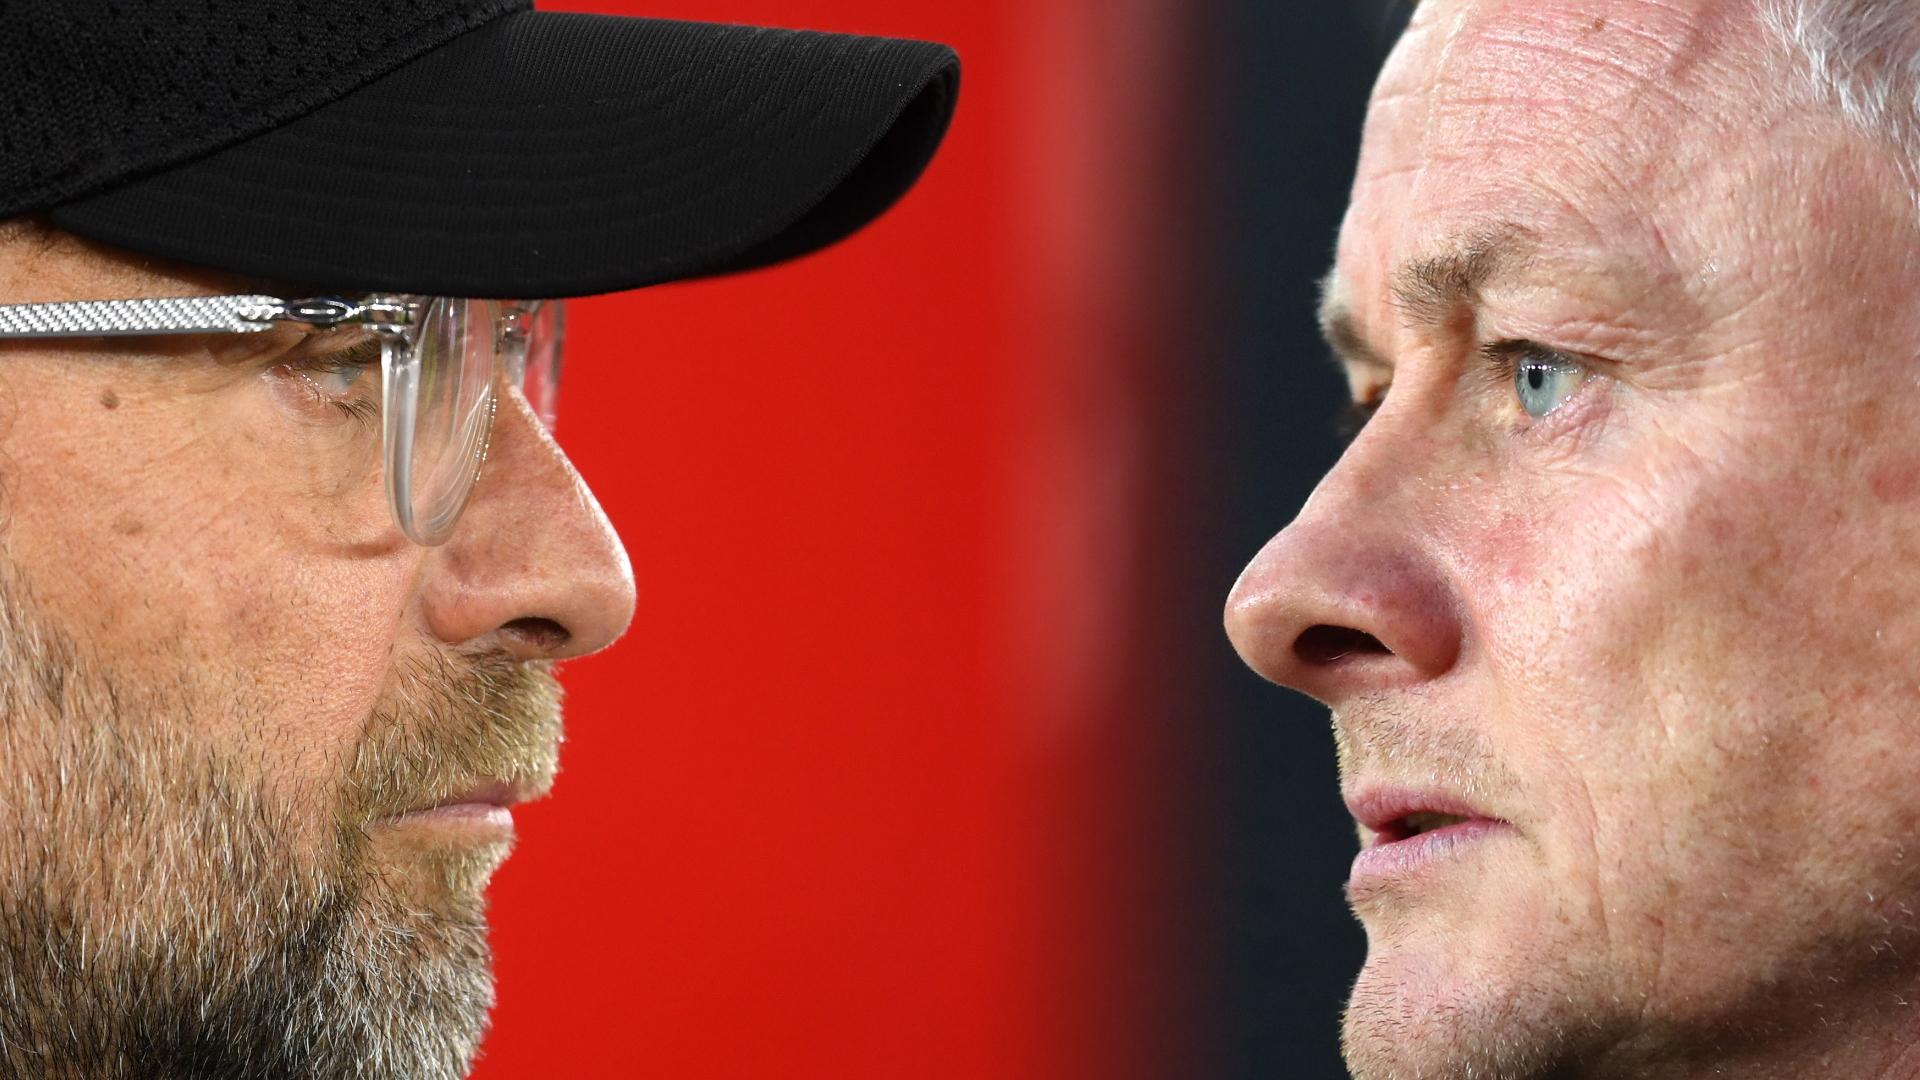 Man Utd's era is over - is Liverpool's EPL dynasty beginning?